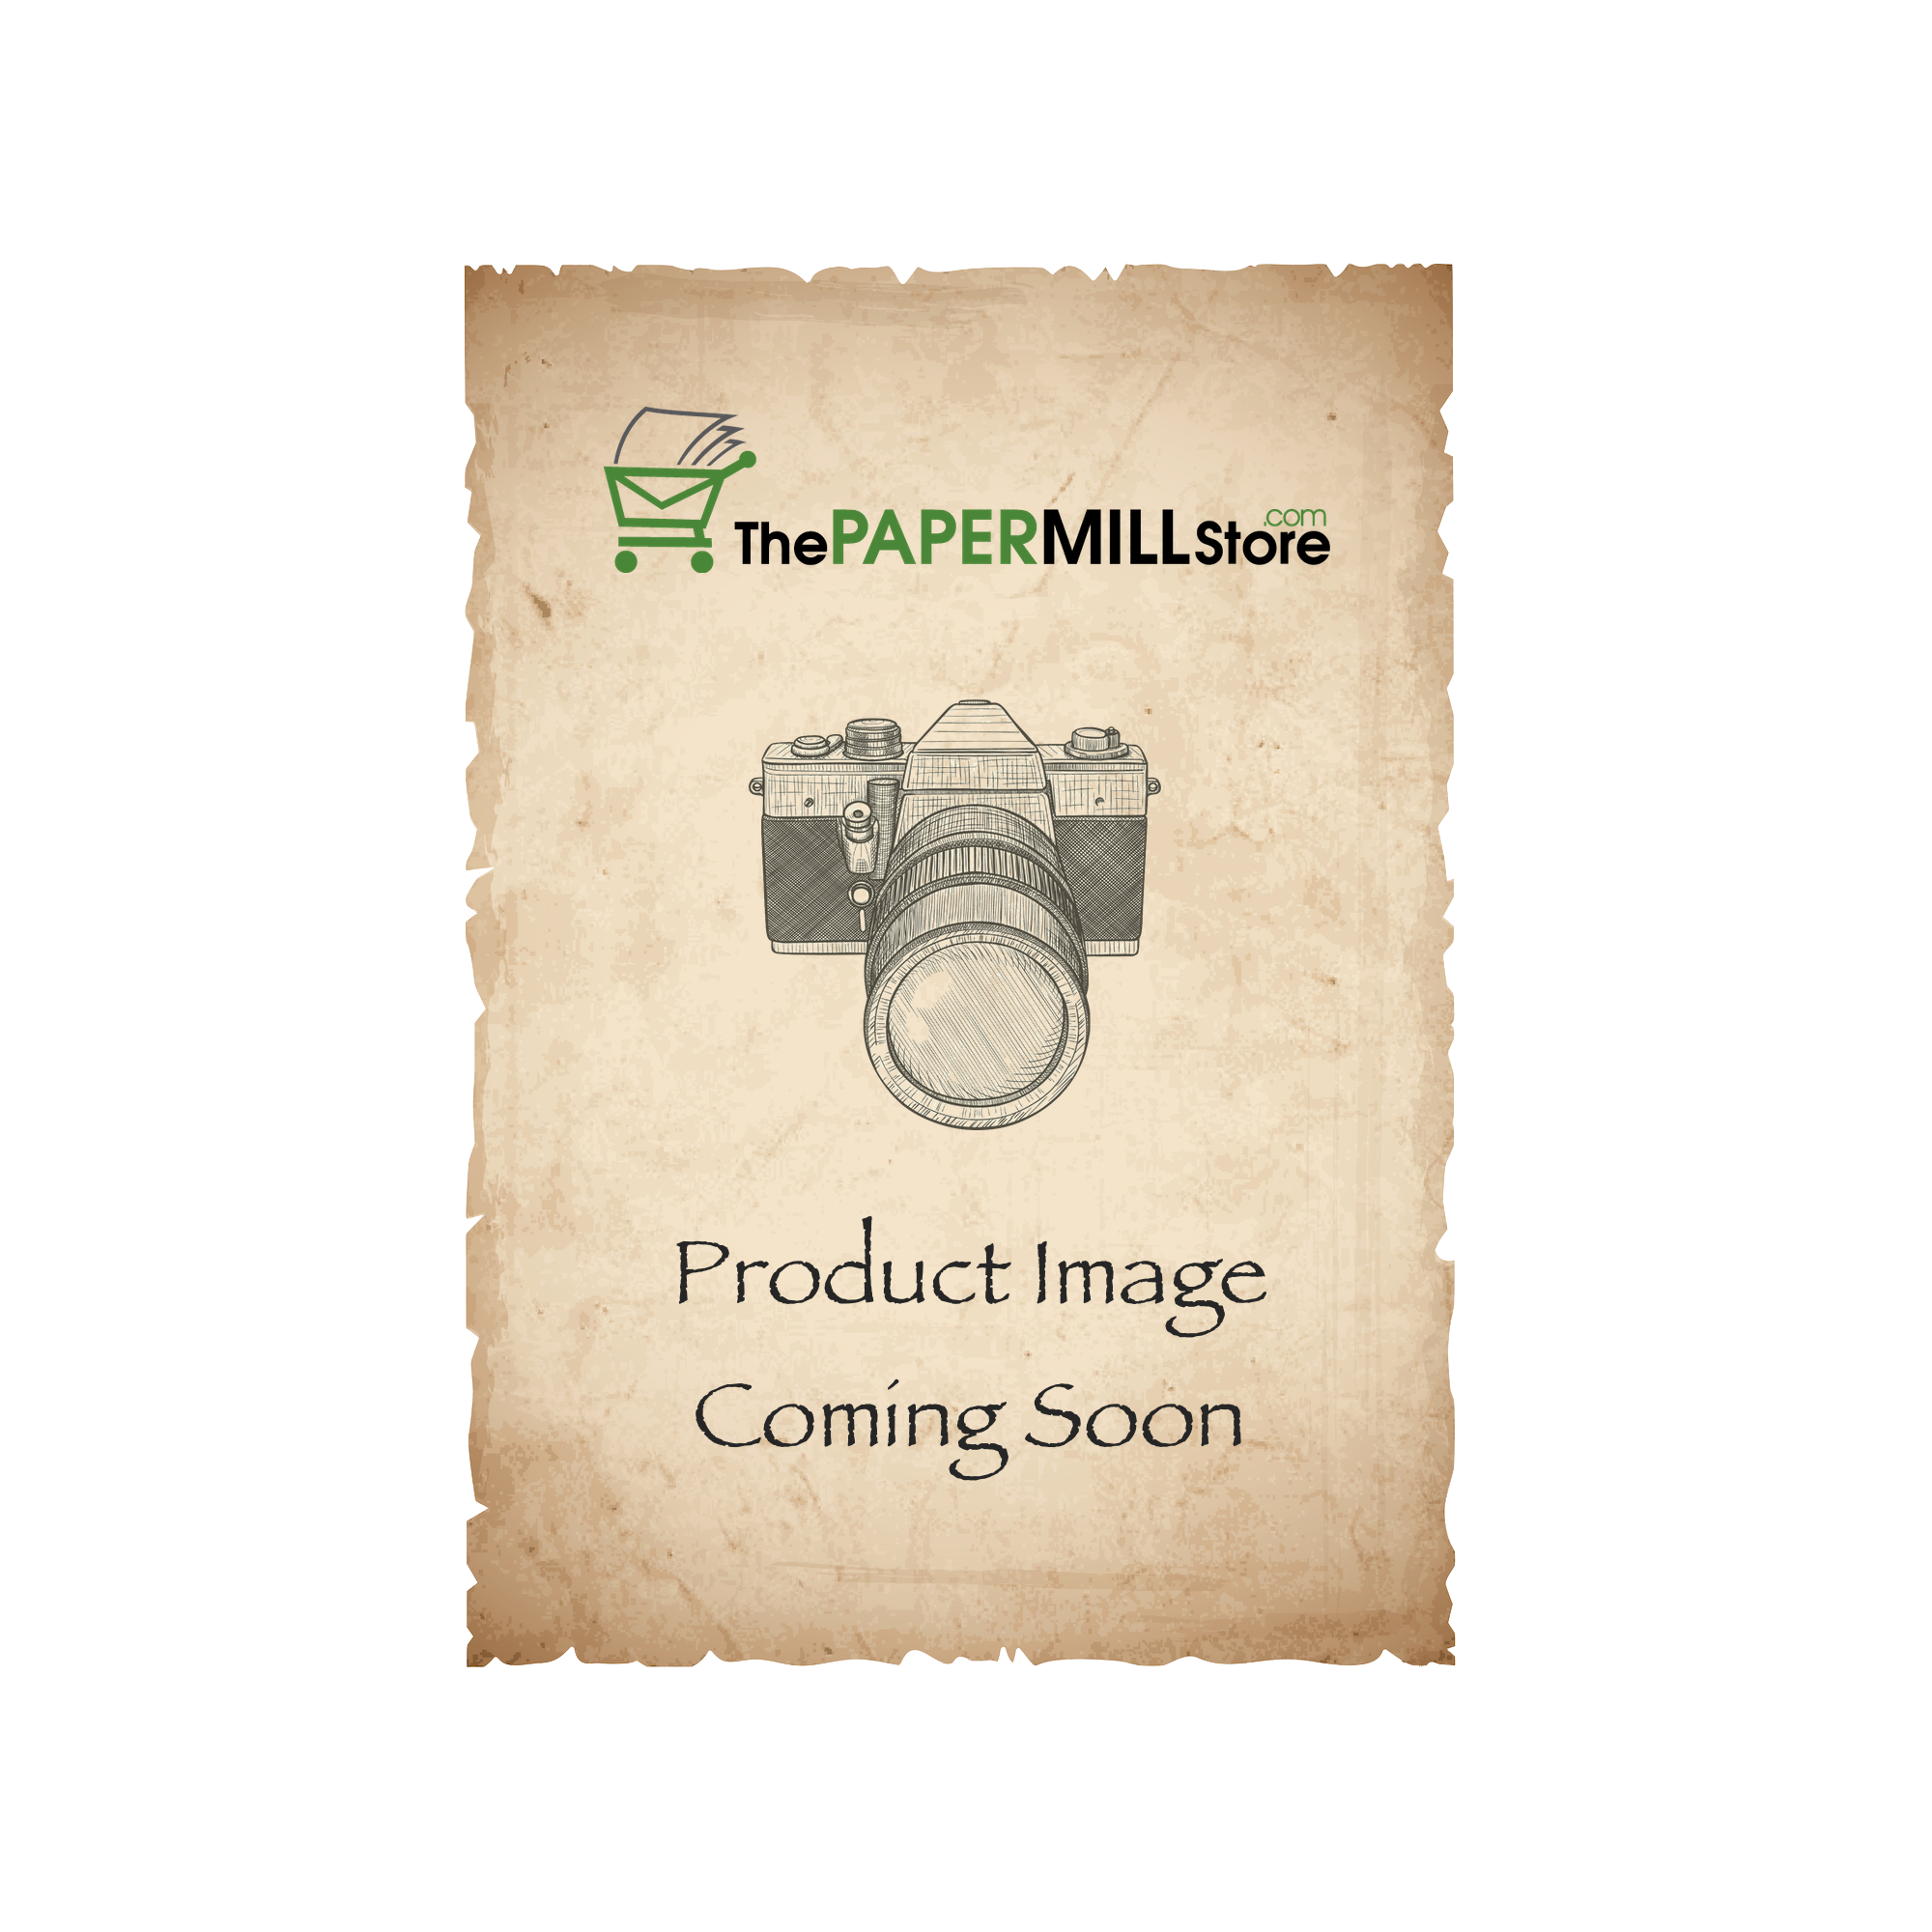 Ultrafelt Warm White Envelopes - No. 10 Commercial (4 1/8 x 9 1/2) 80 lb Text Premium Felt  30% Recycled 2500 per Carton